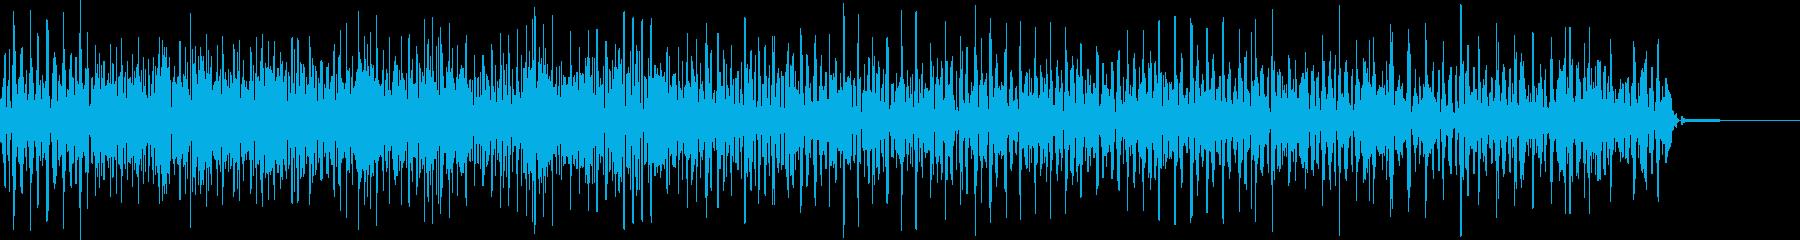 AMGアナログFX 23の再生済みの波形